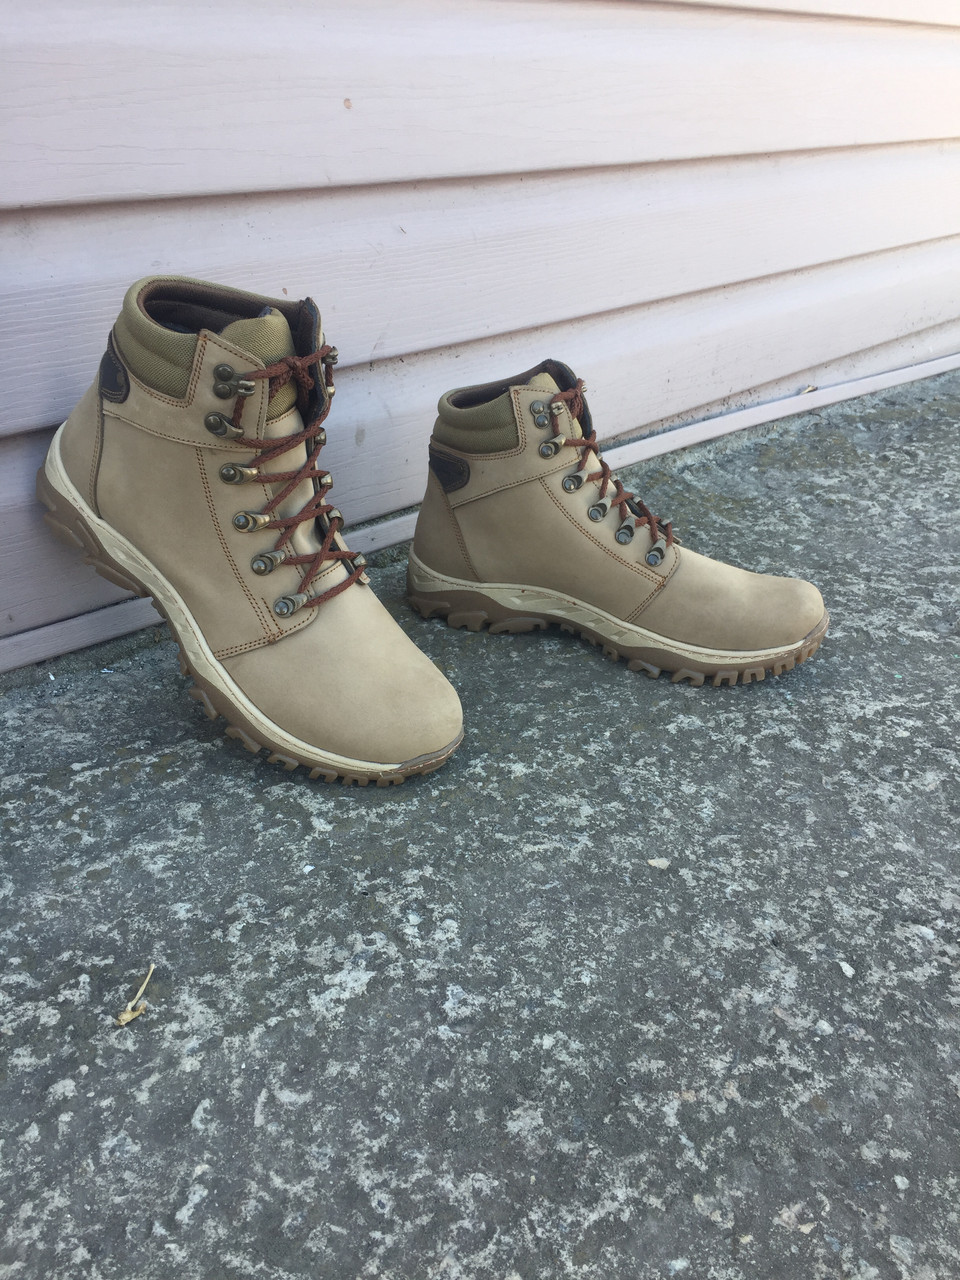 Ботинки Техно кожа нубук бежевые